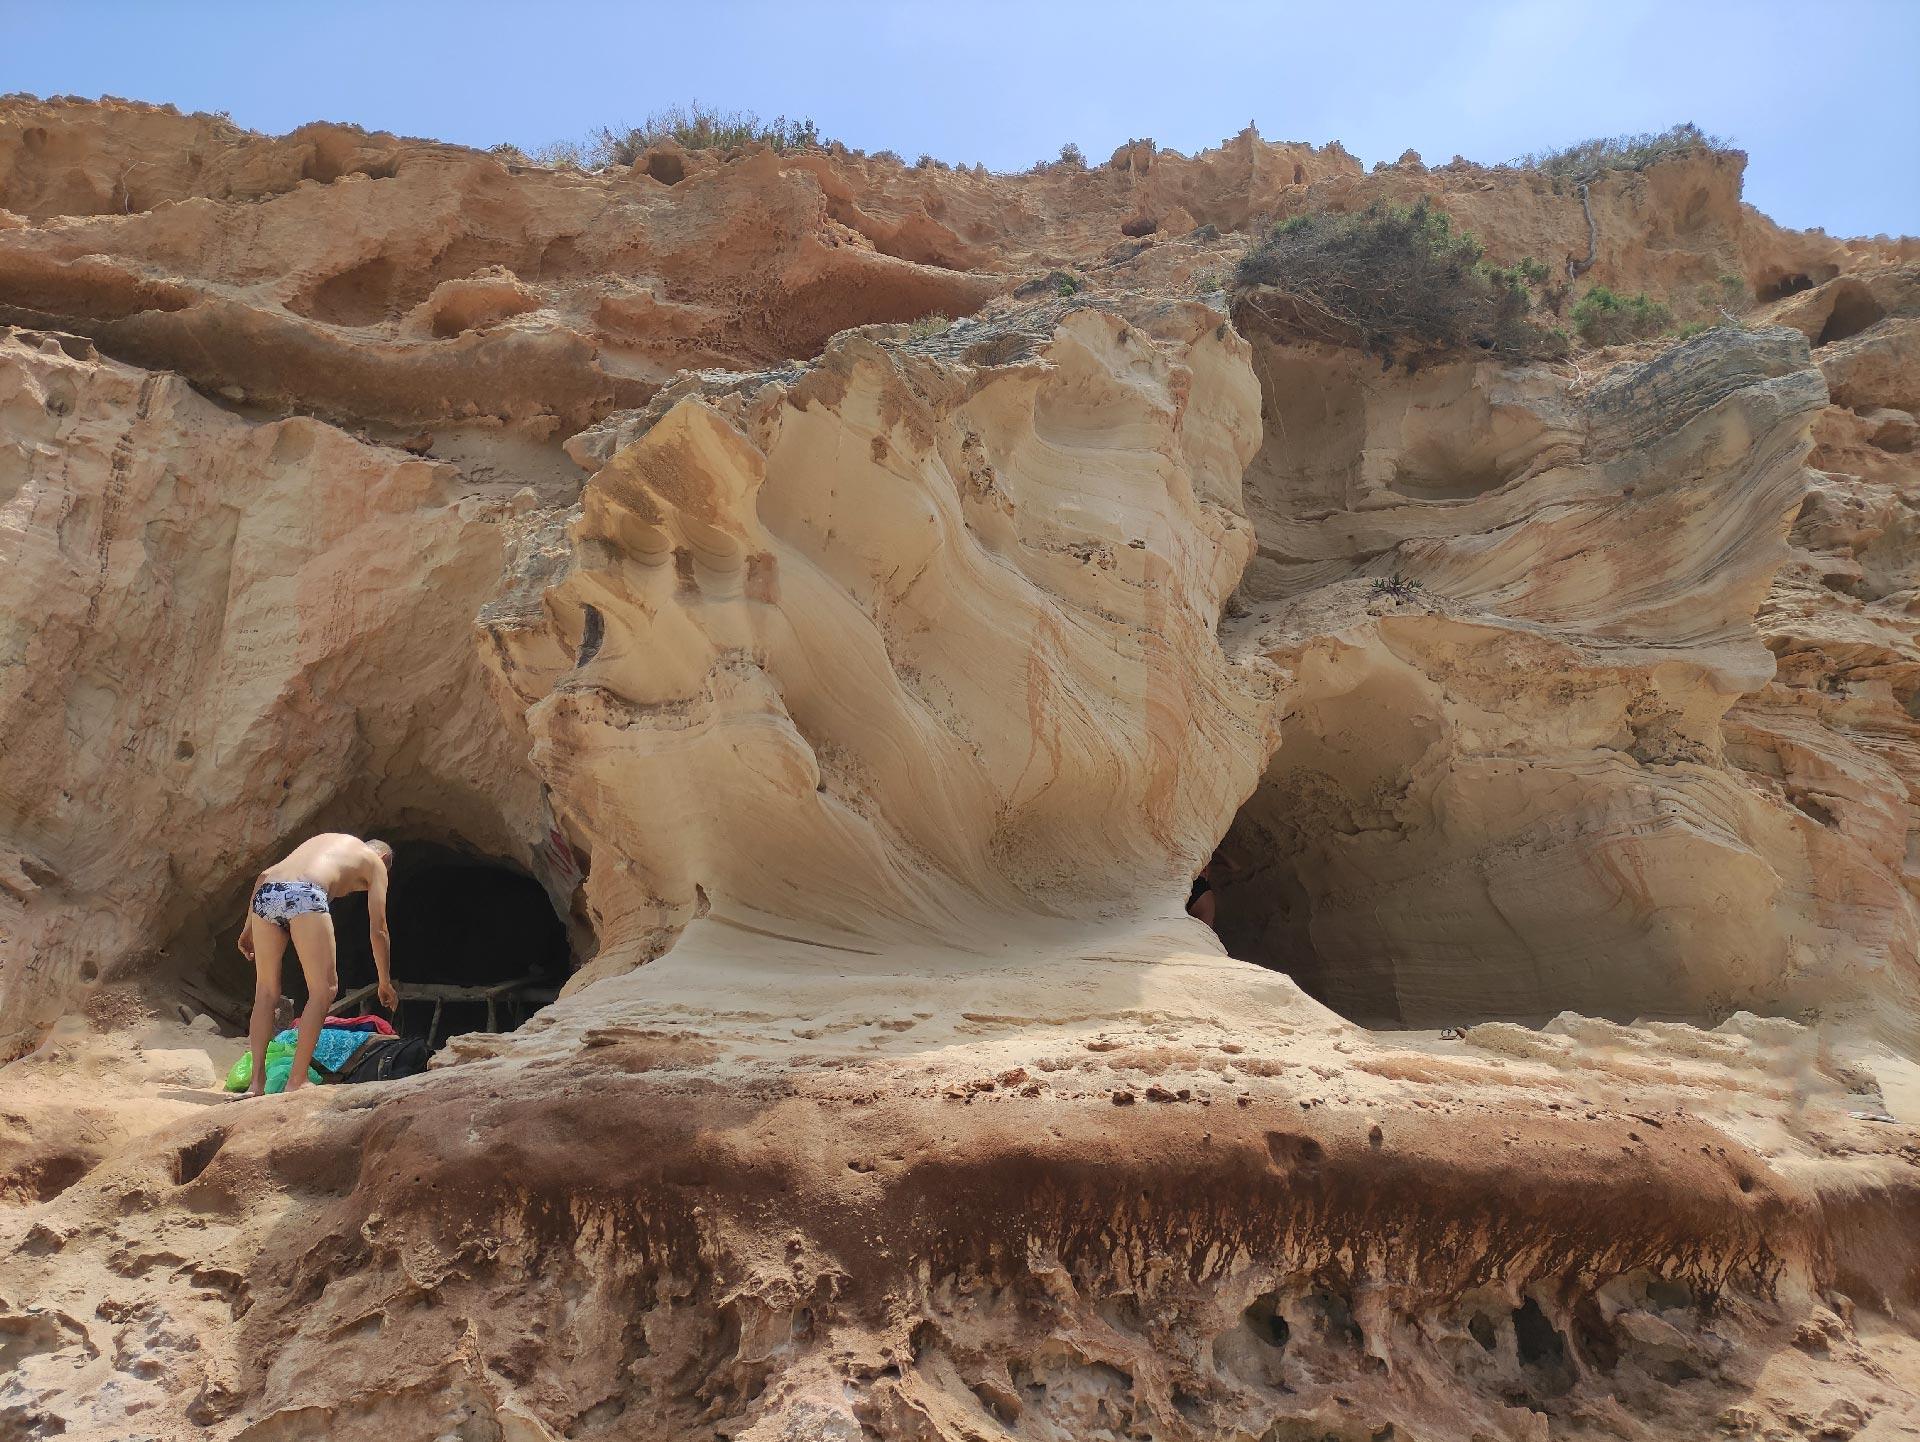 Le grotte di Cala en Baster